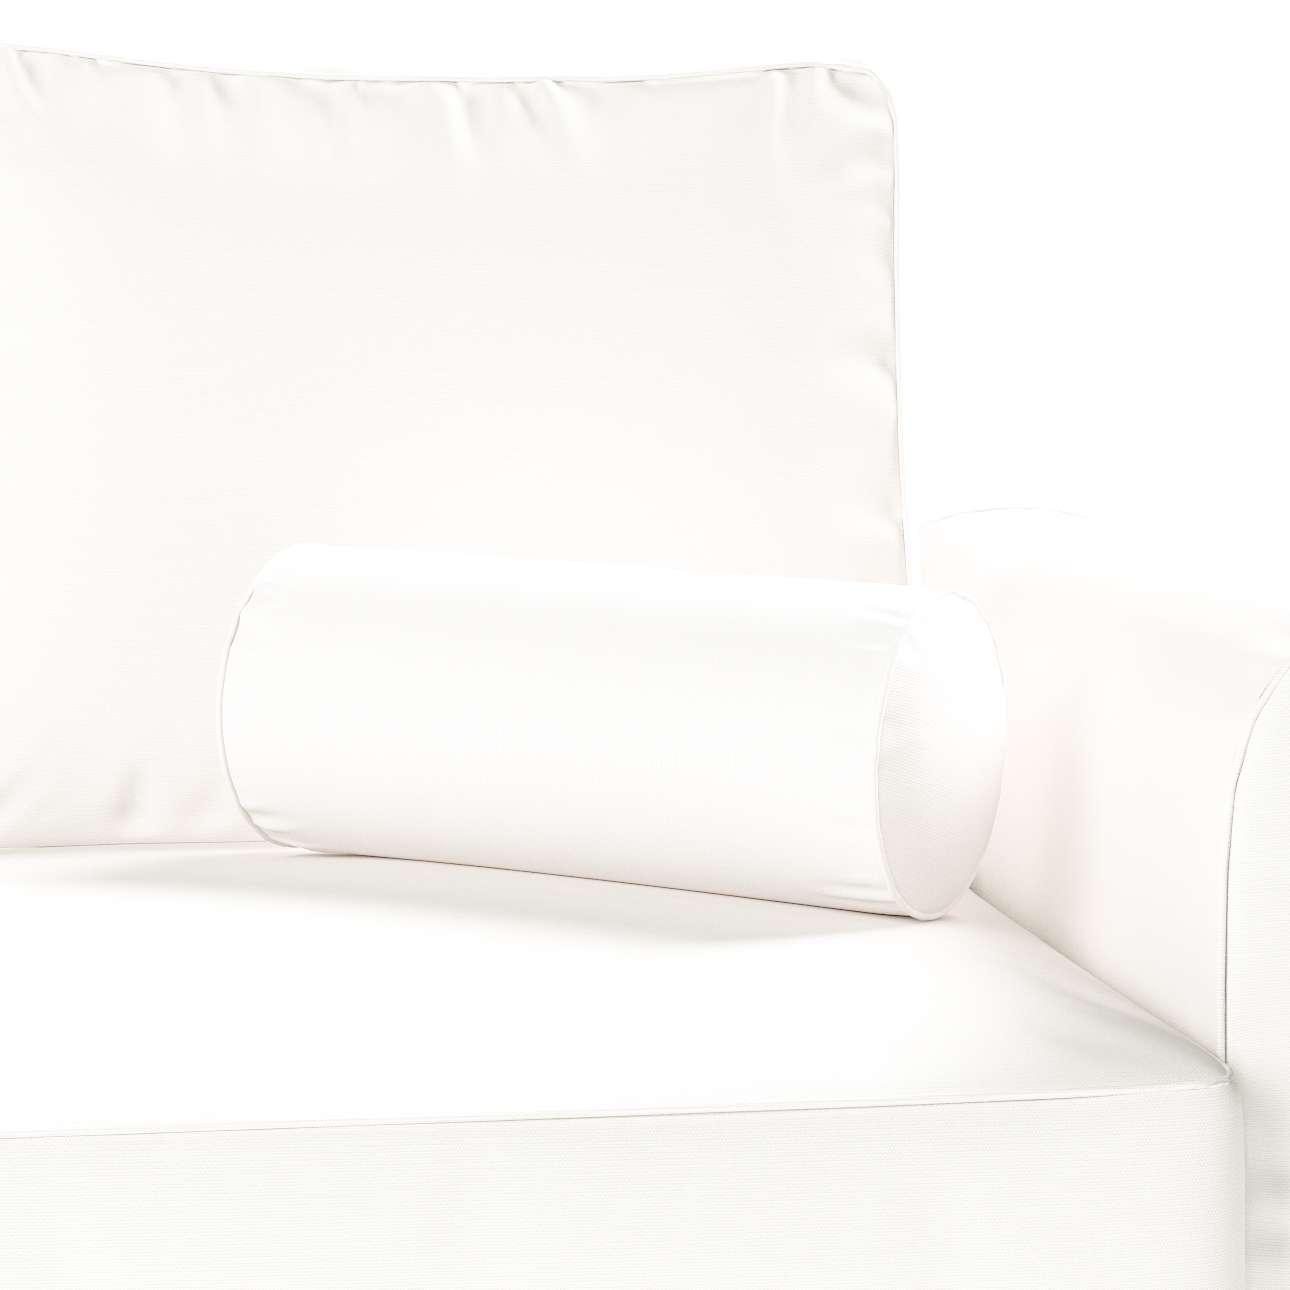 Valček jednoduchý V kolekcii Cotton Panama, tkanina: 702-34